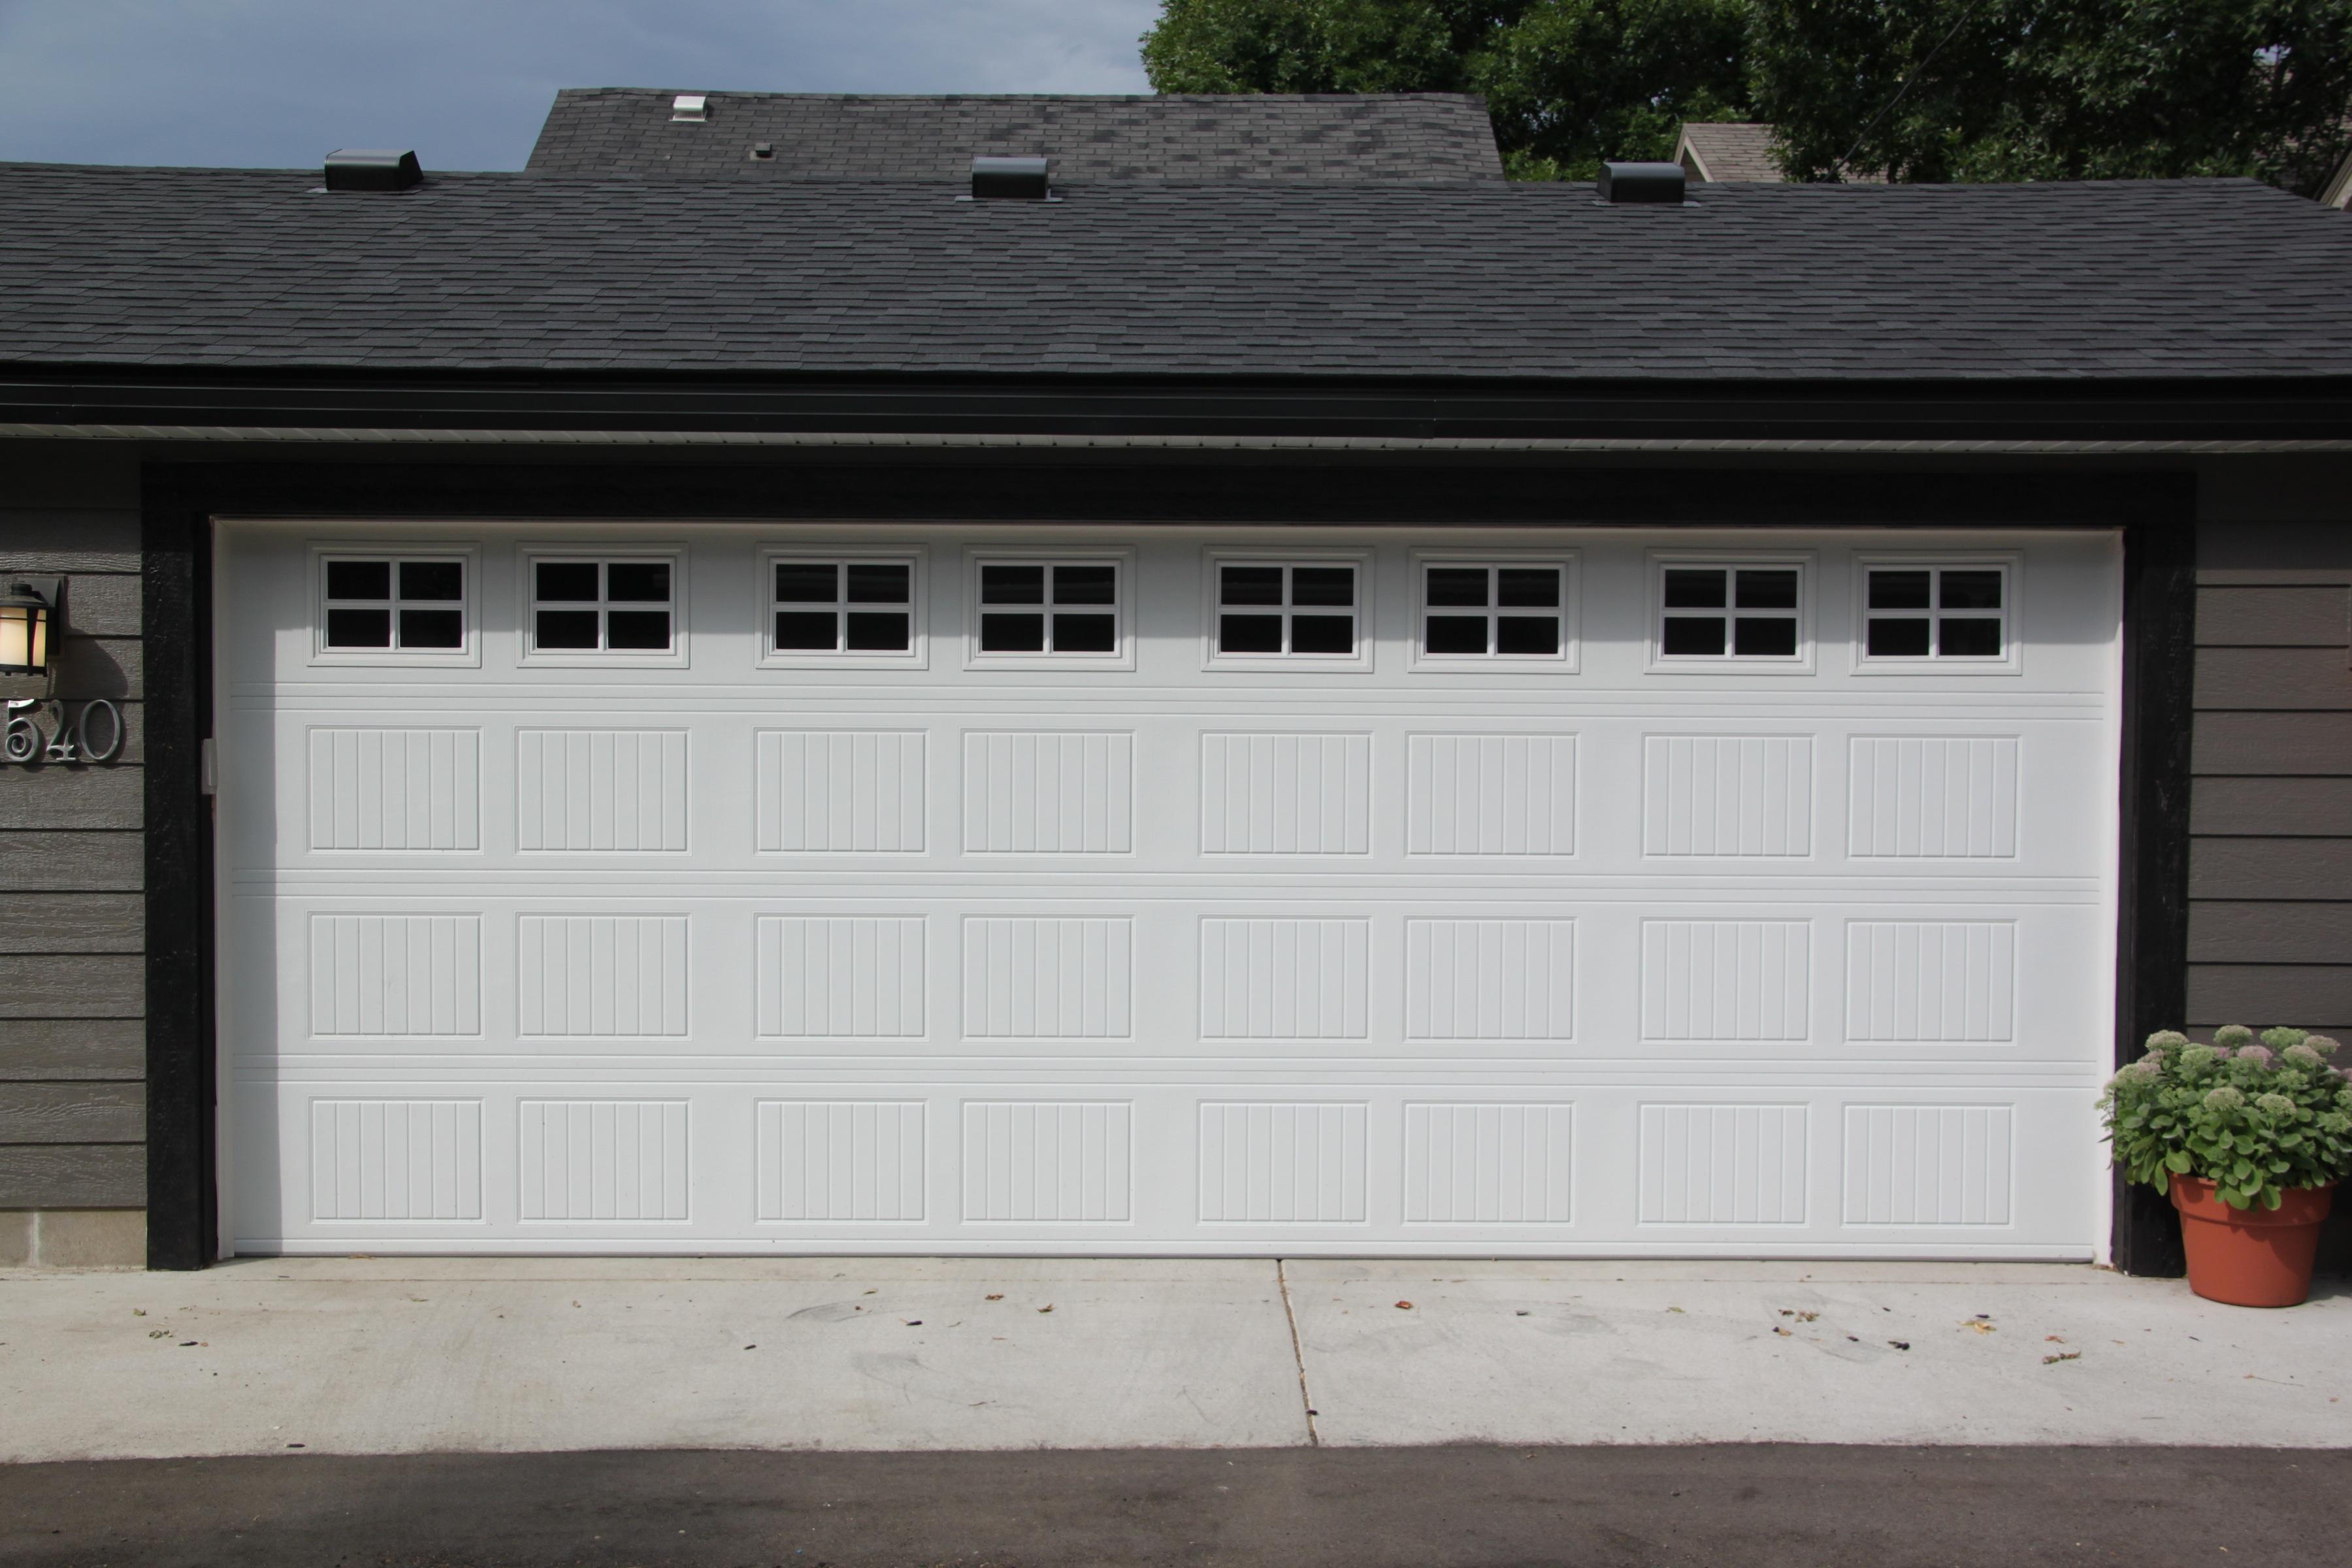 St paul garage home office for St paul garage door repair